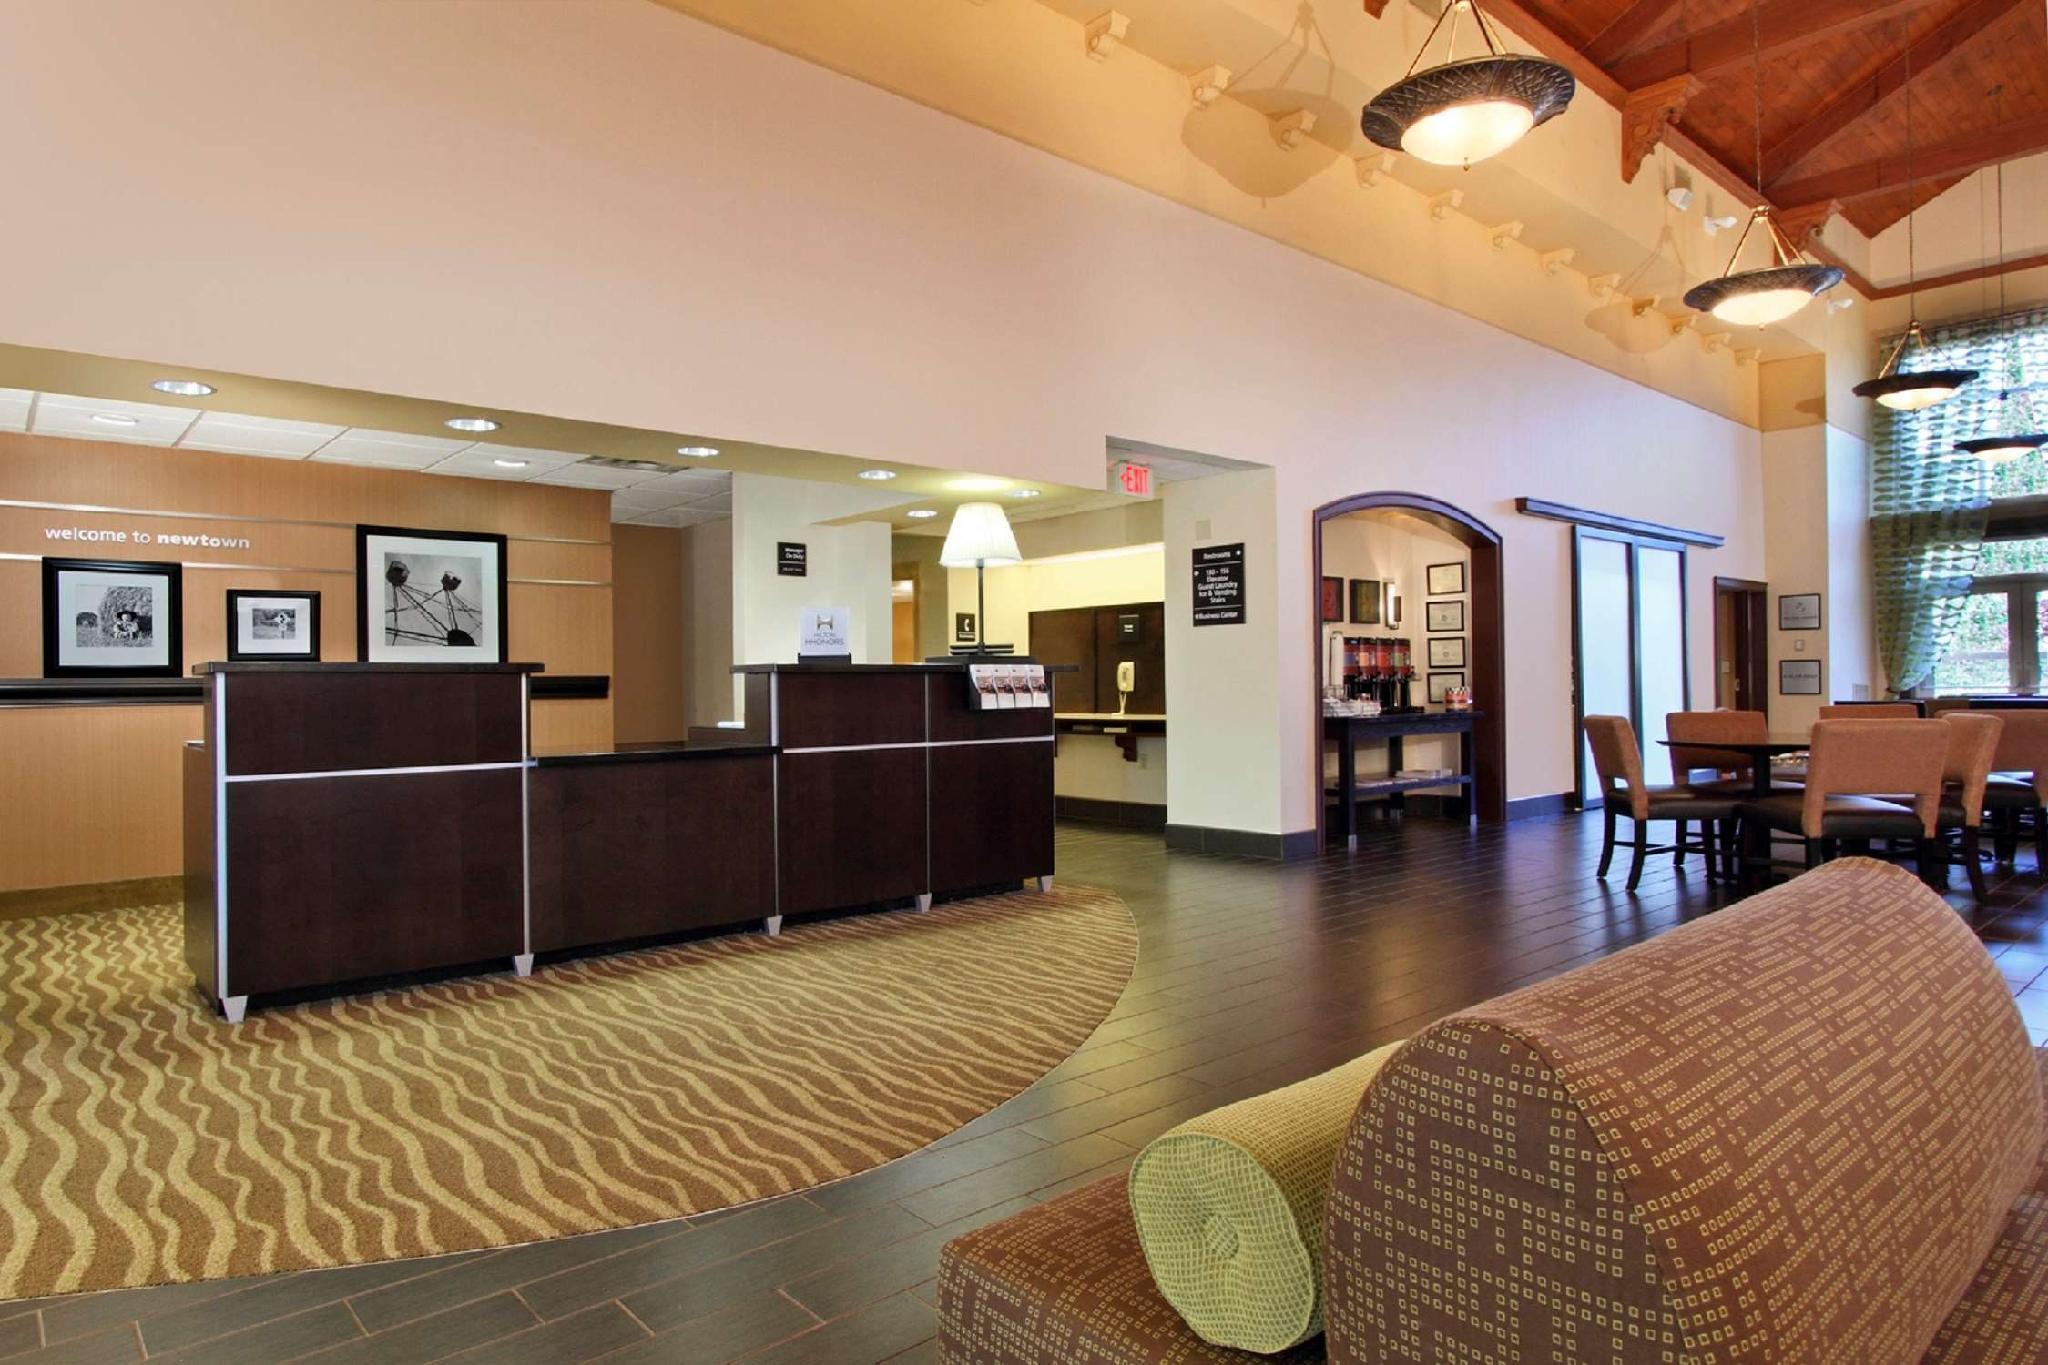 Hampton Inn And Suites Newtown